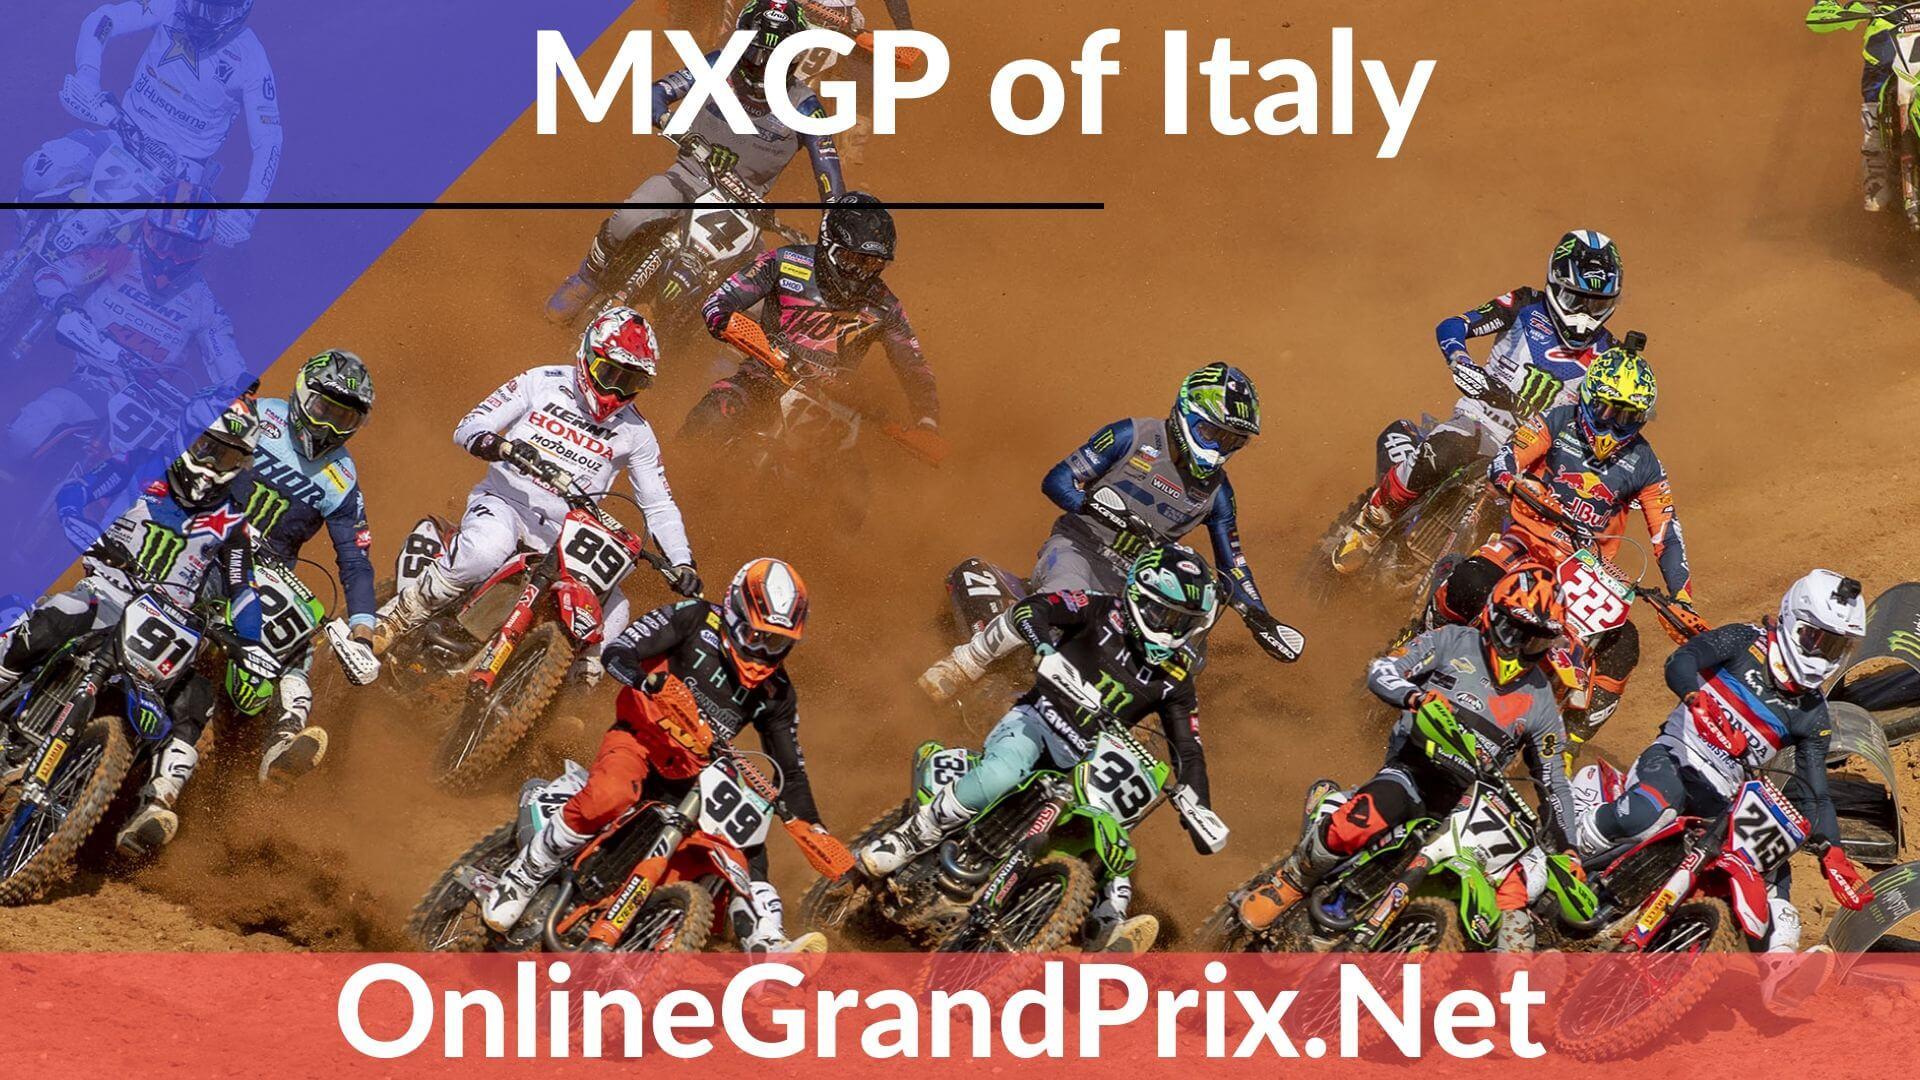 Italy MXGP Live Stream 2020 | FIM MotoCross WC